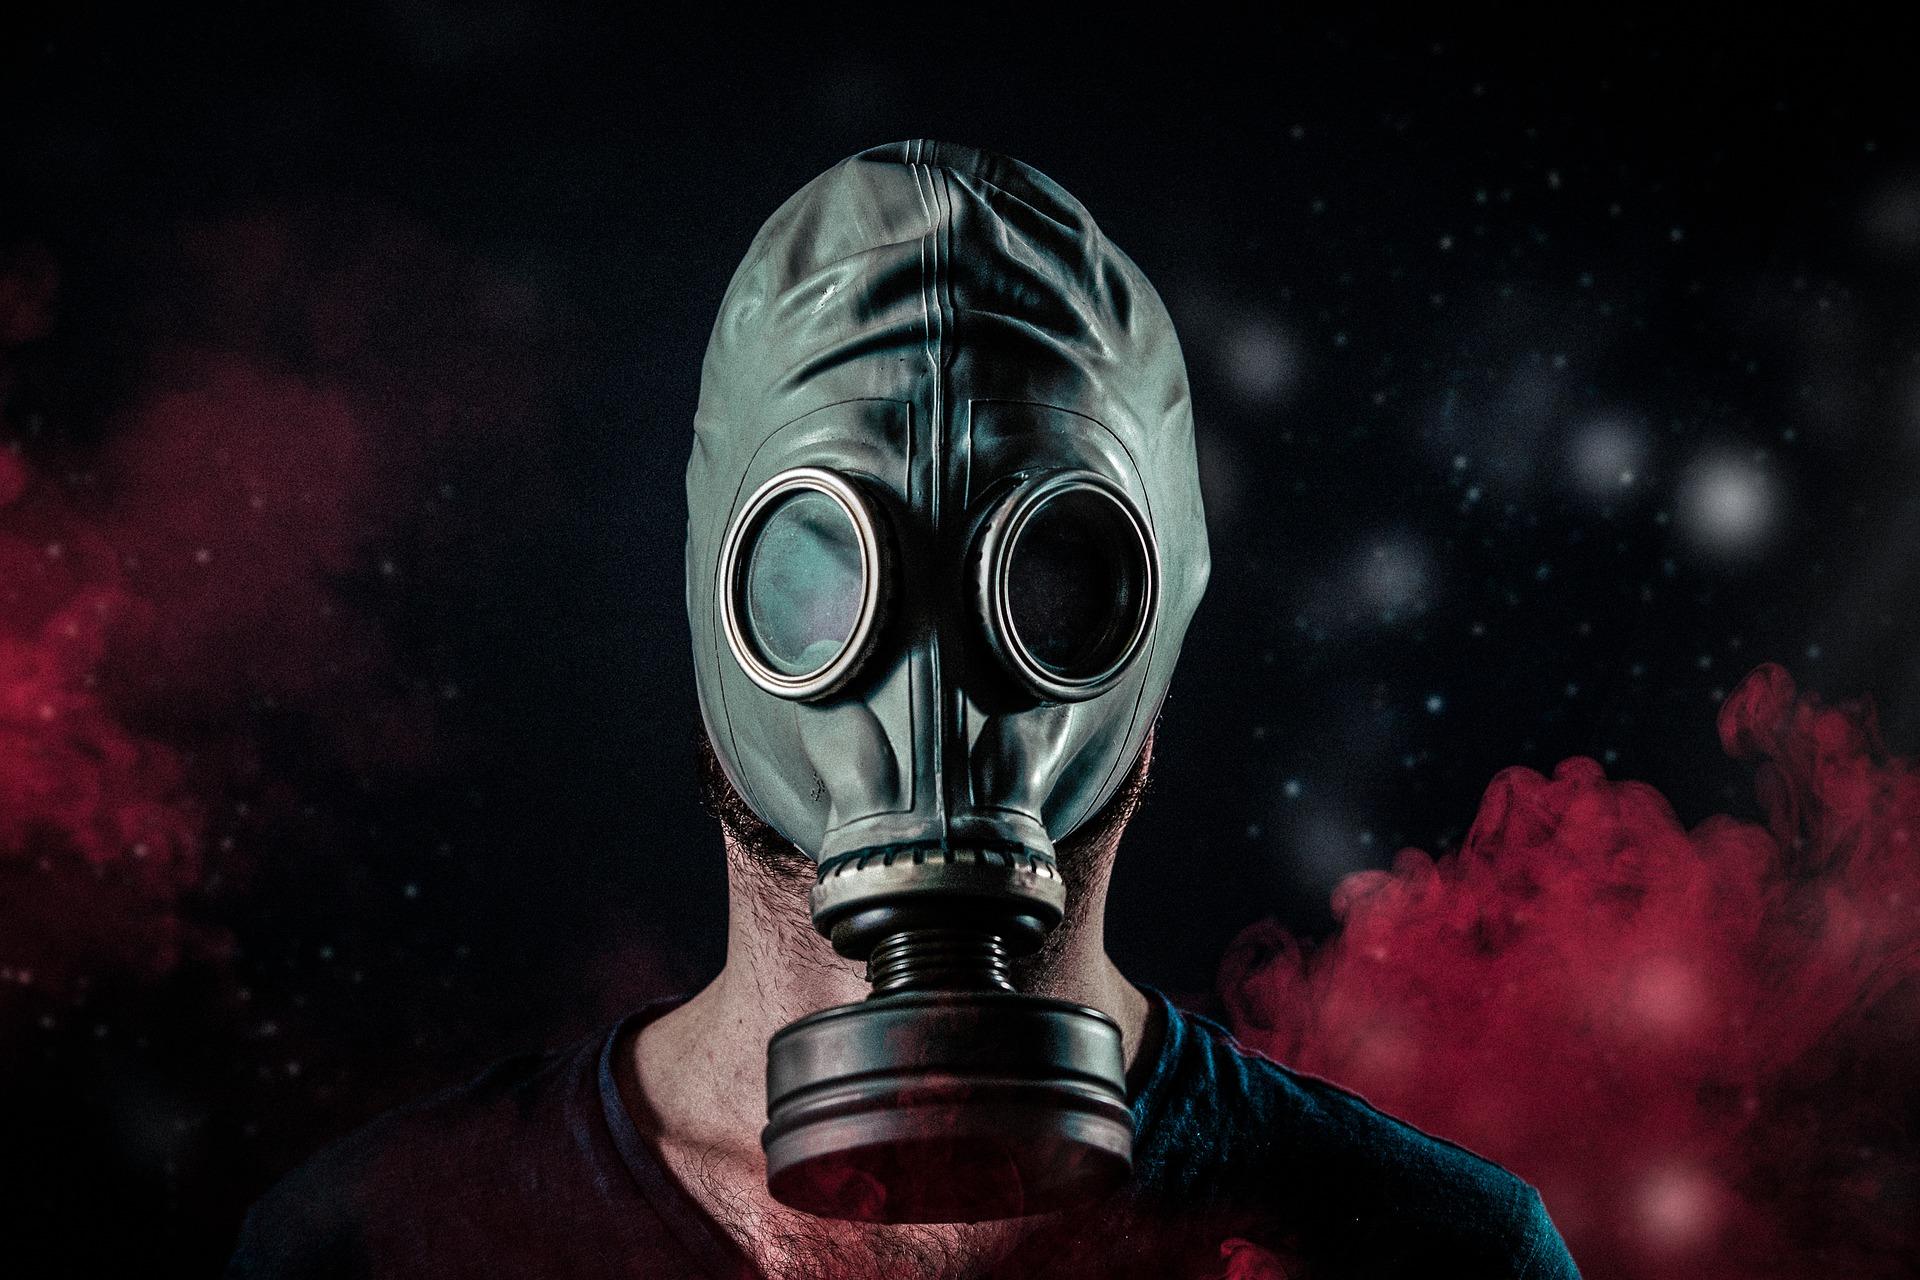 detoxifiere relatii toxice - sfatulparintilor.ro - pixabay_com - gas-2400340_1920